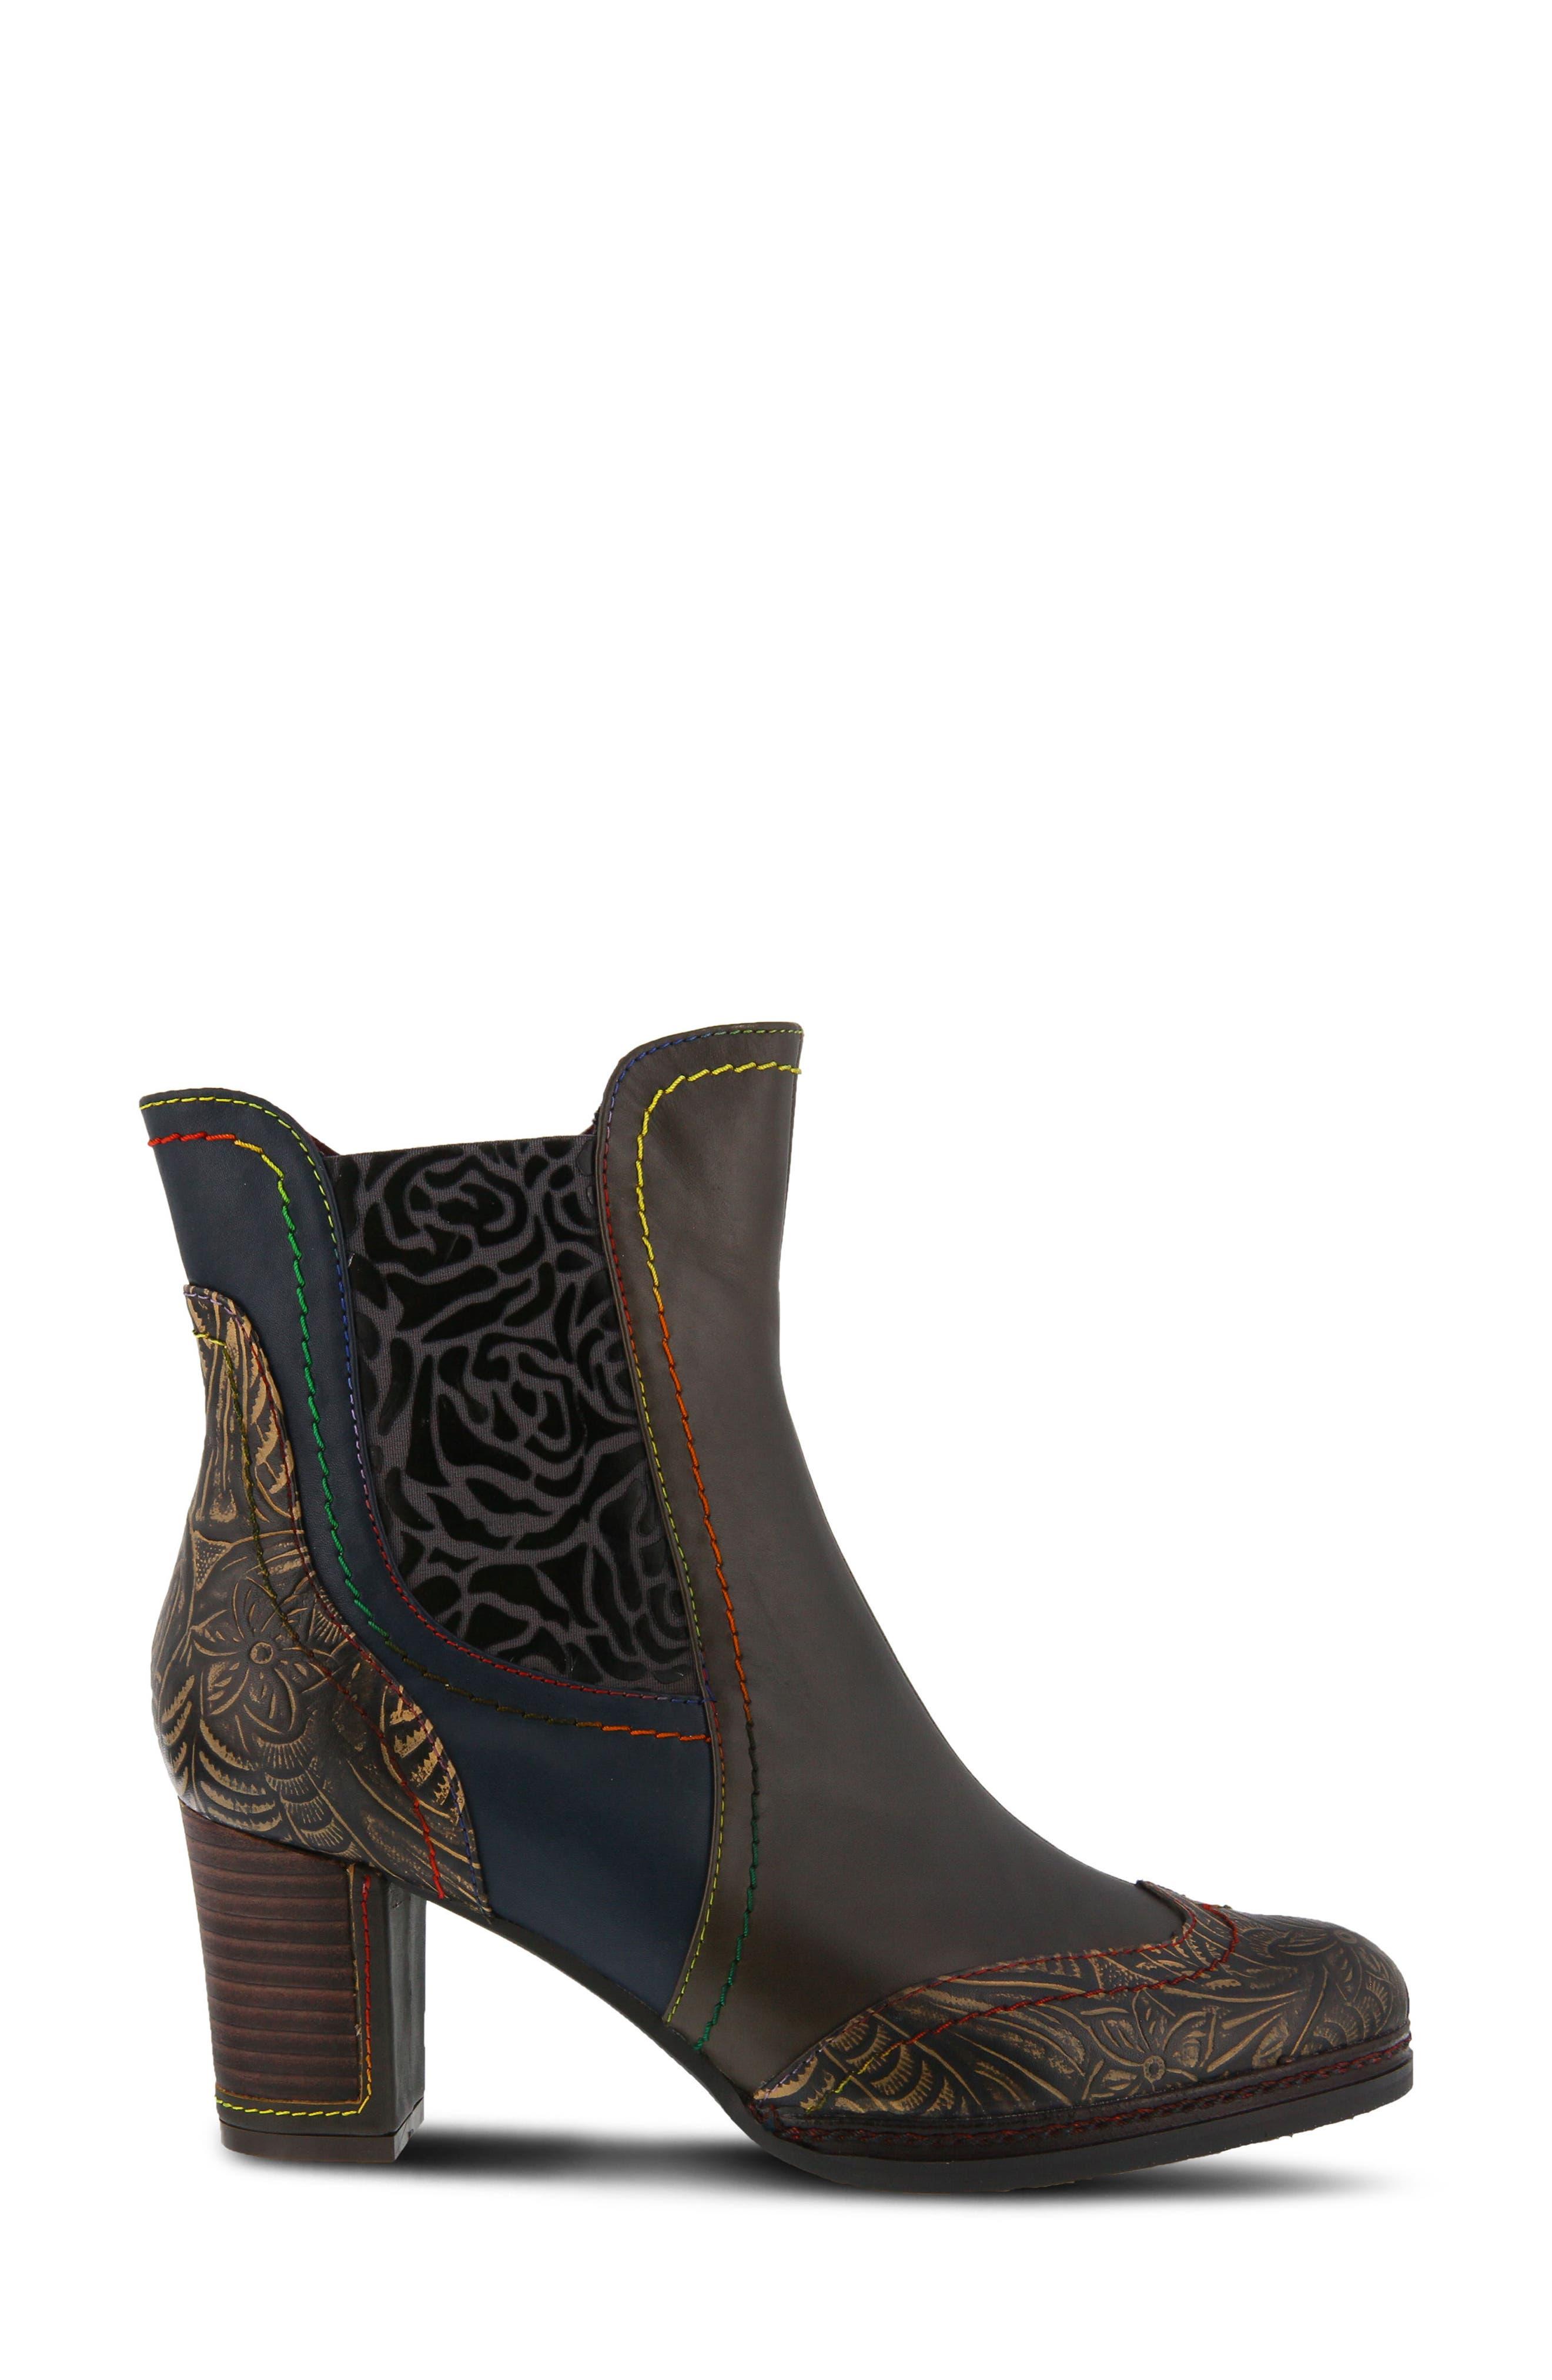 L'Artiste Santana Boot,                             Alternate thumbnail 3, color,                             Olive Green Leather